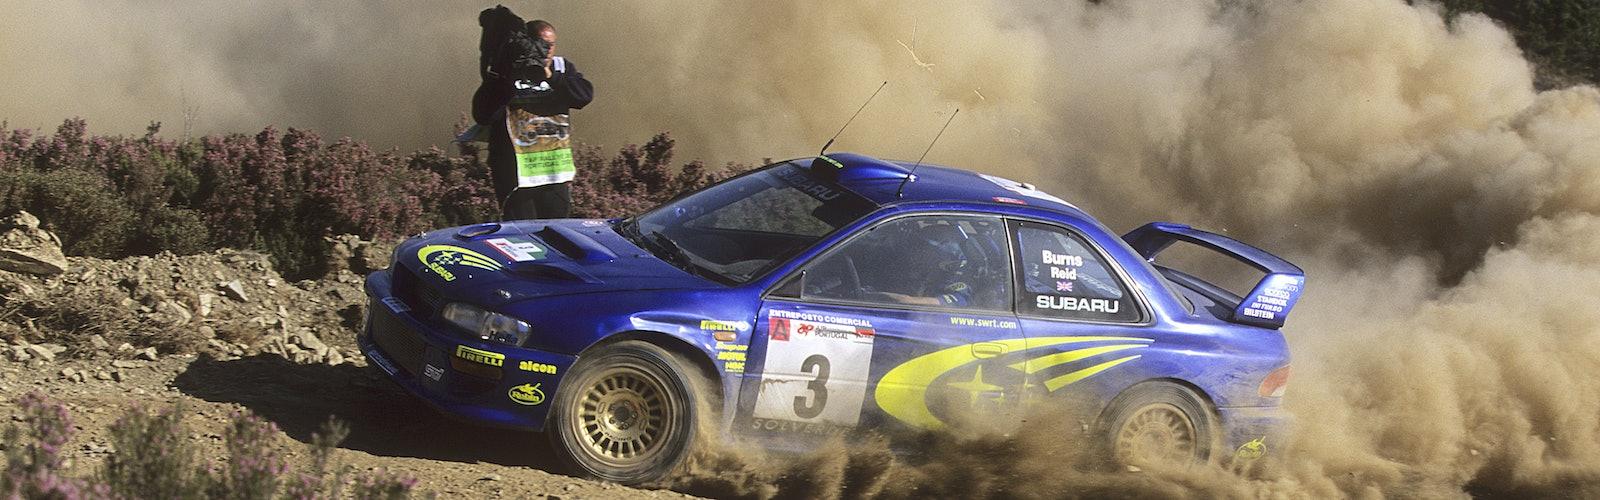 2000 Portugal Rally world wide copyright: McKlein